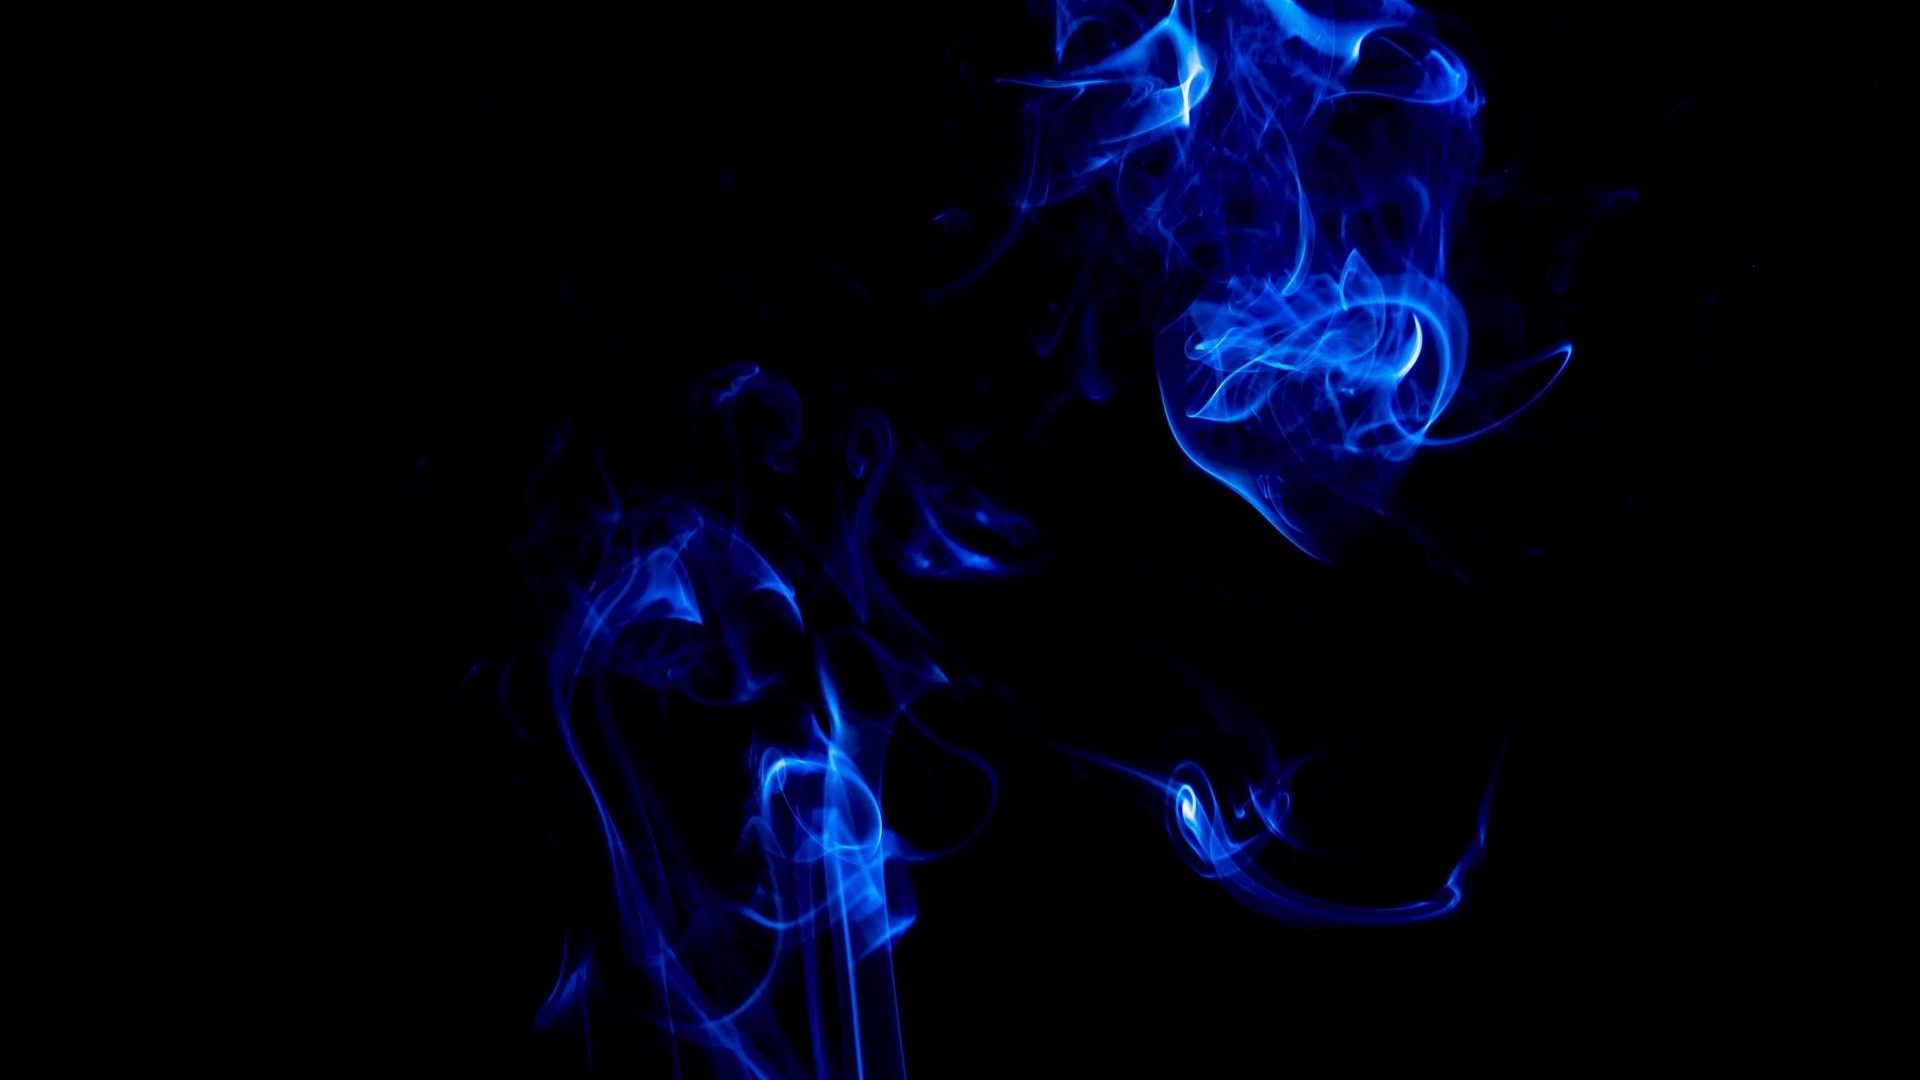 Blue Smoke At The Dark Hd Wallpaper Iphone 7 Plus Iphone 8 Plus